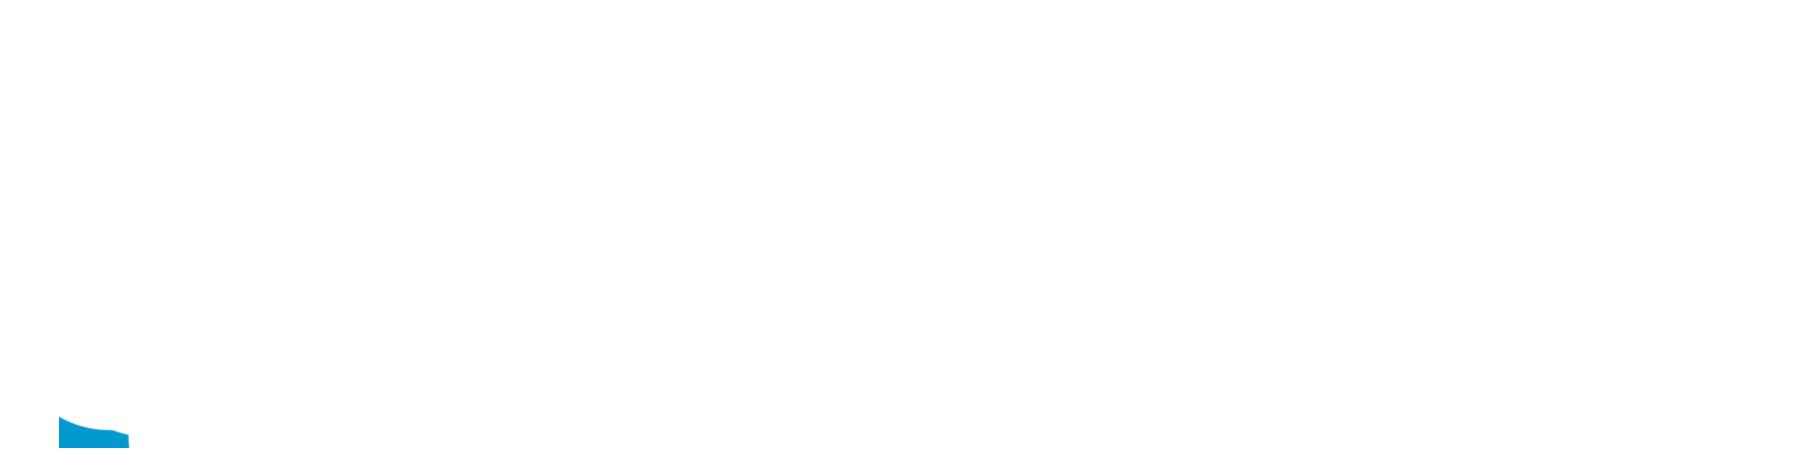 Learning - Enjoyment - Aspiration - Determination